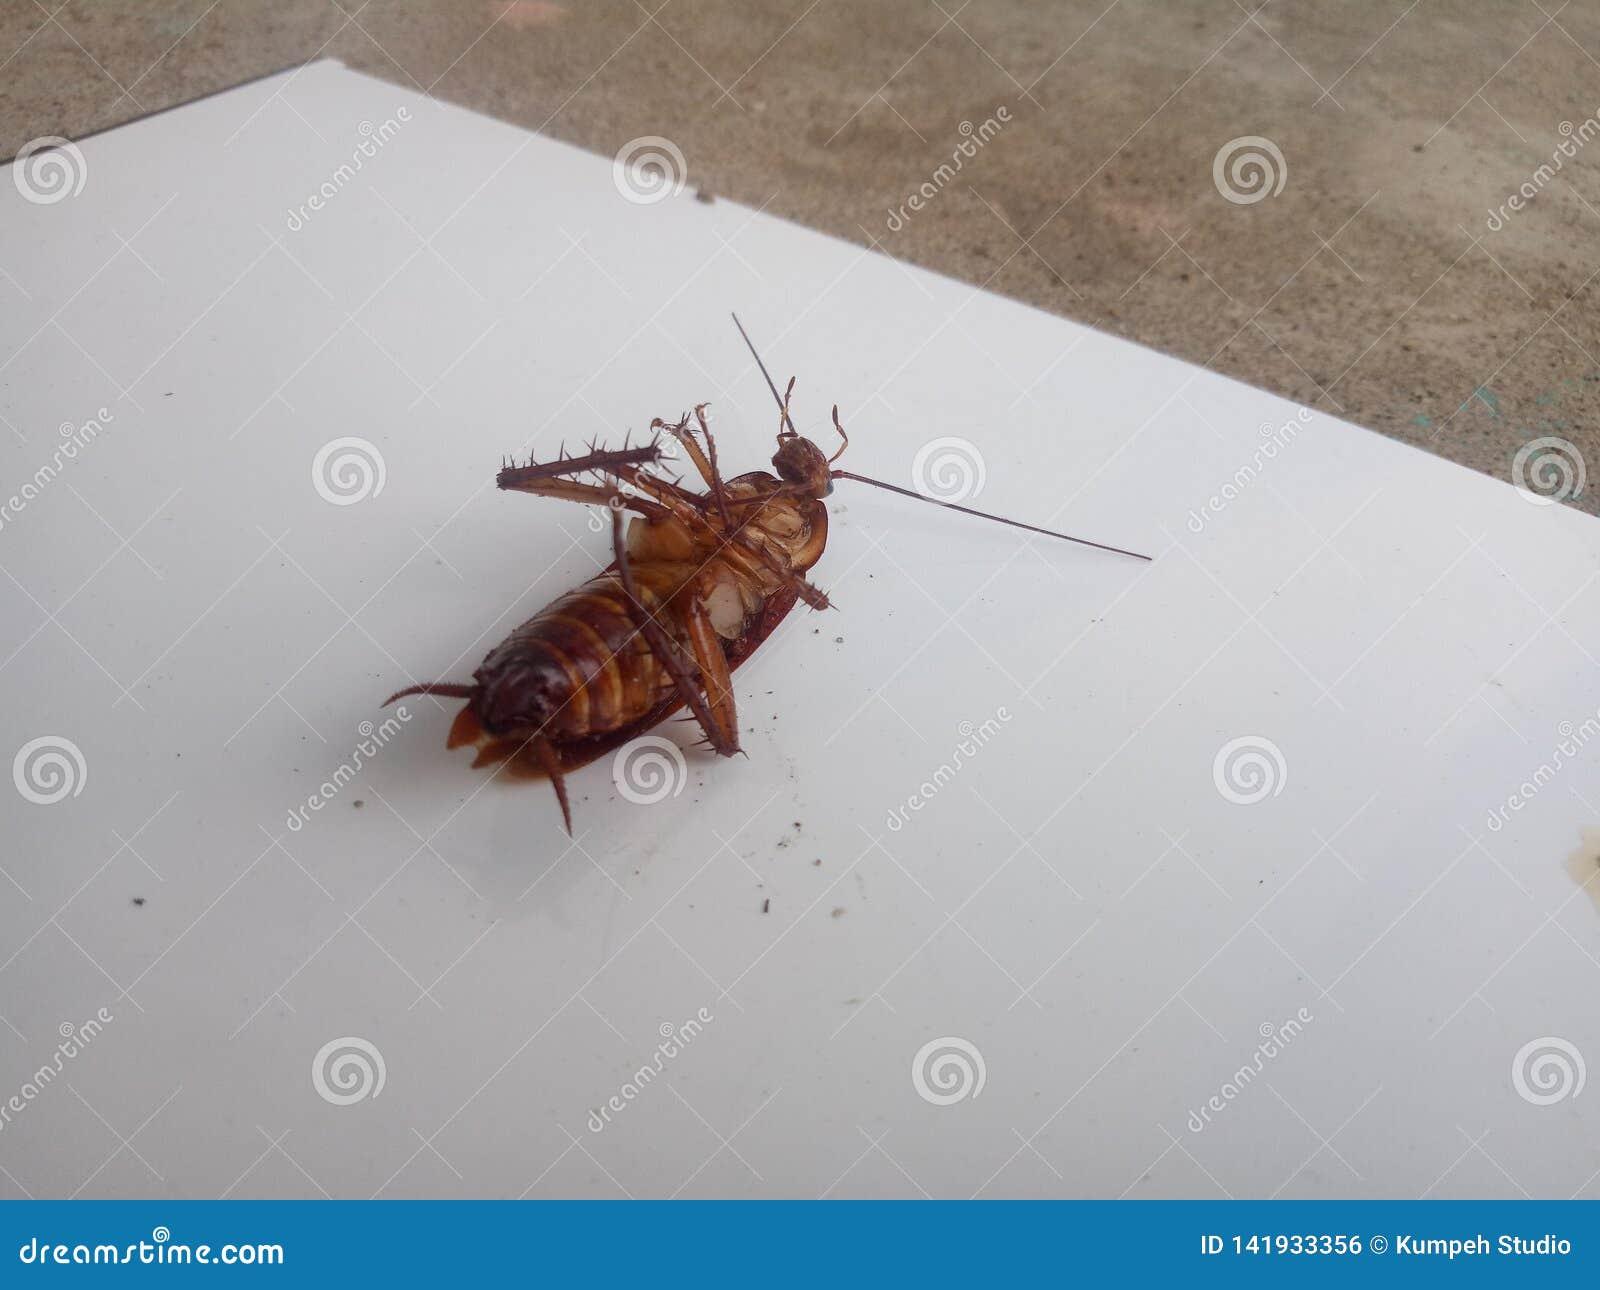 Dode kakkerlakken op een witte achtergrond kakkerlakkenbeeld